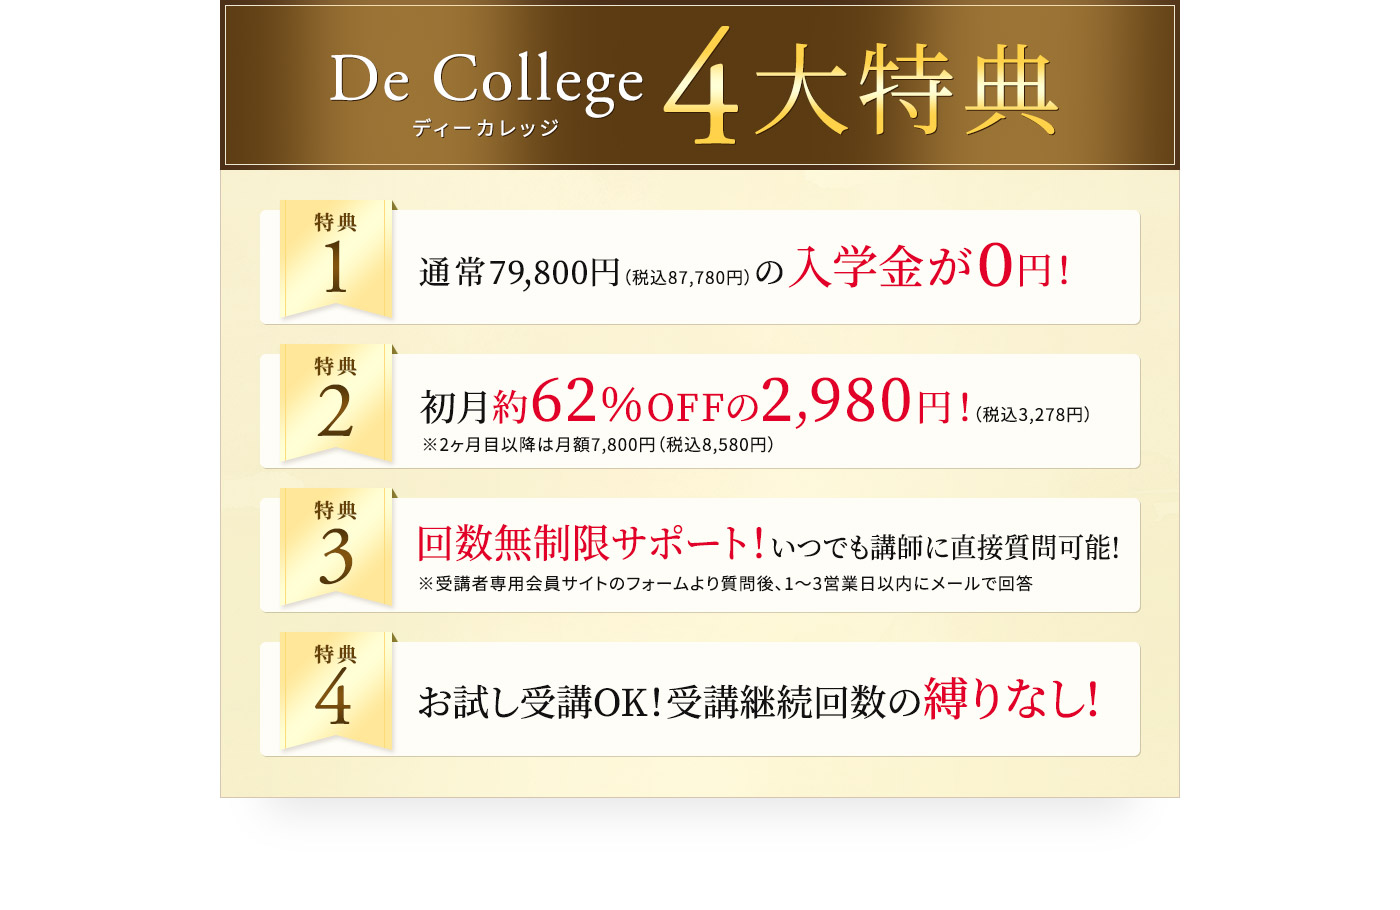 De College 4大特典